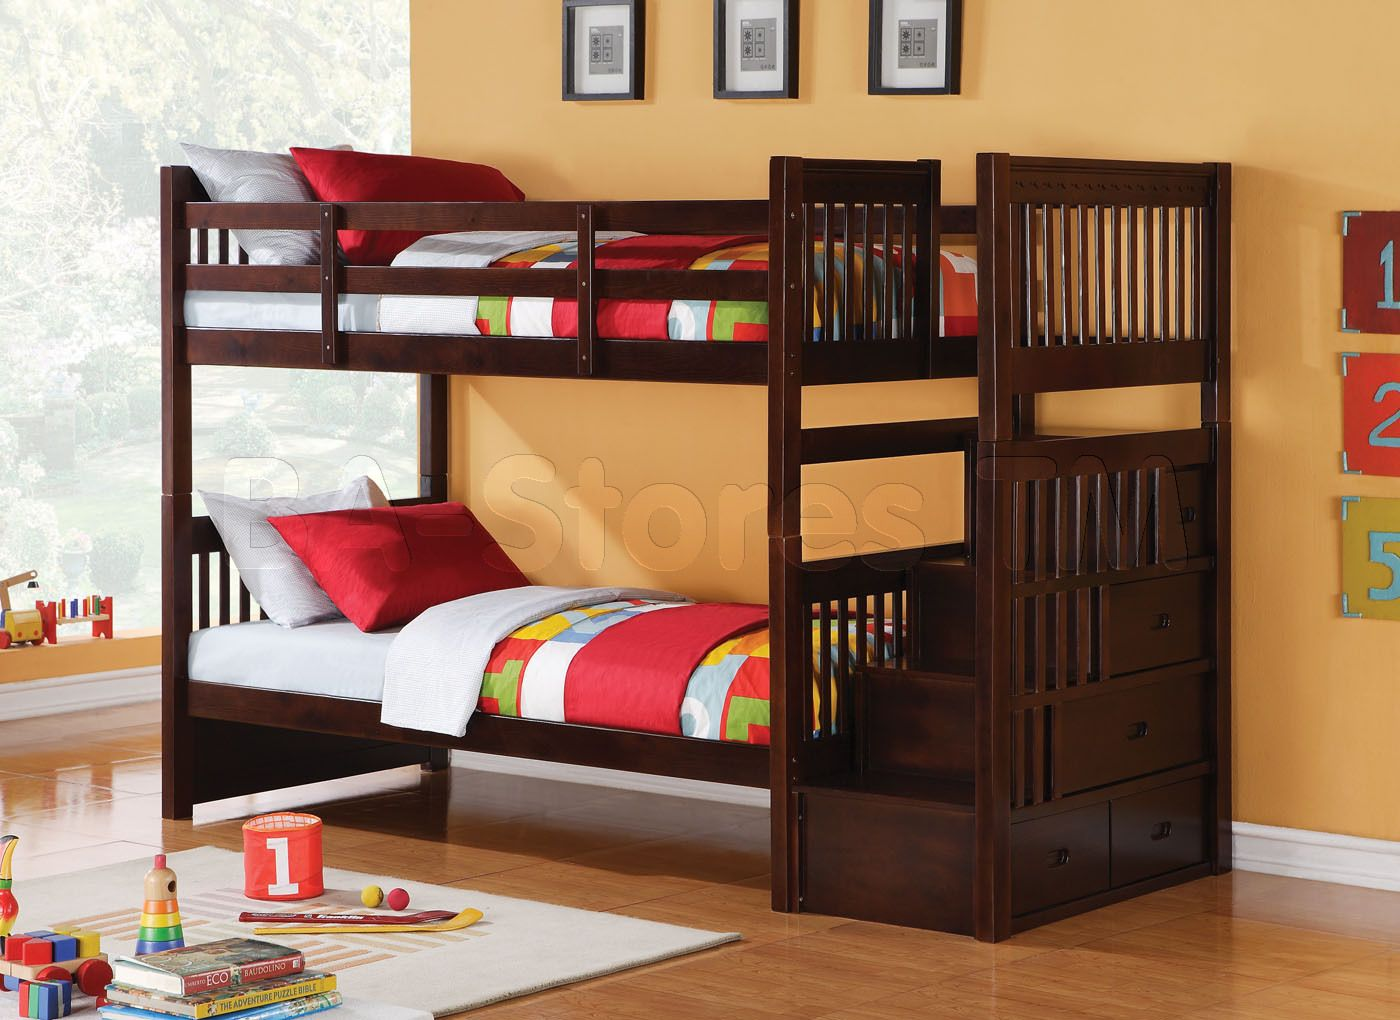 Alem Espresso Twin Bunk Bed Storage Ladder